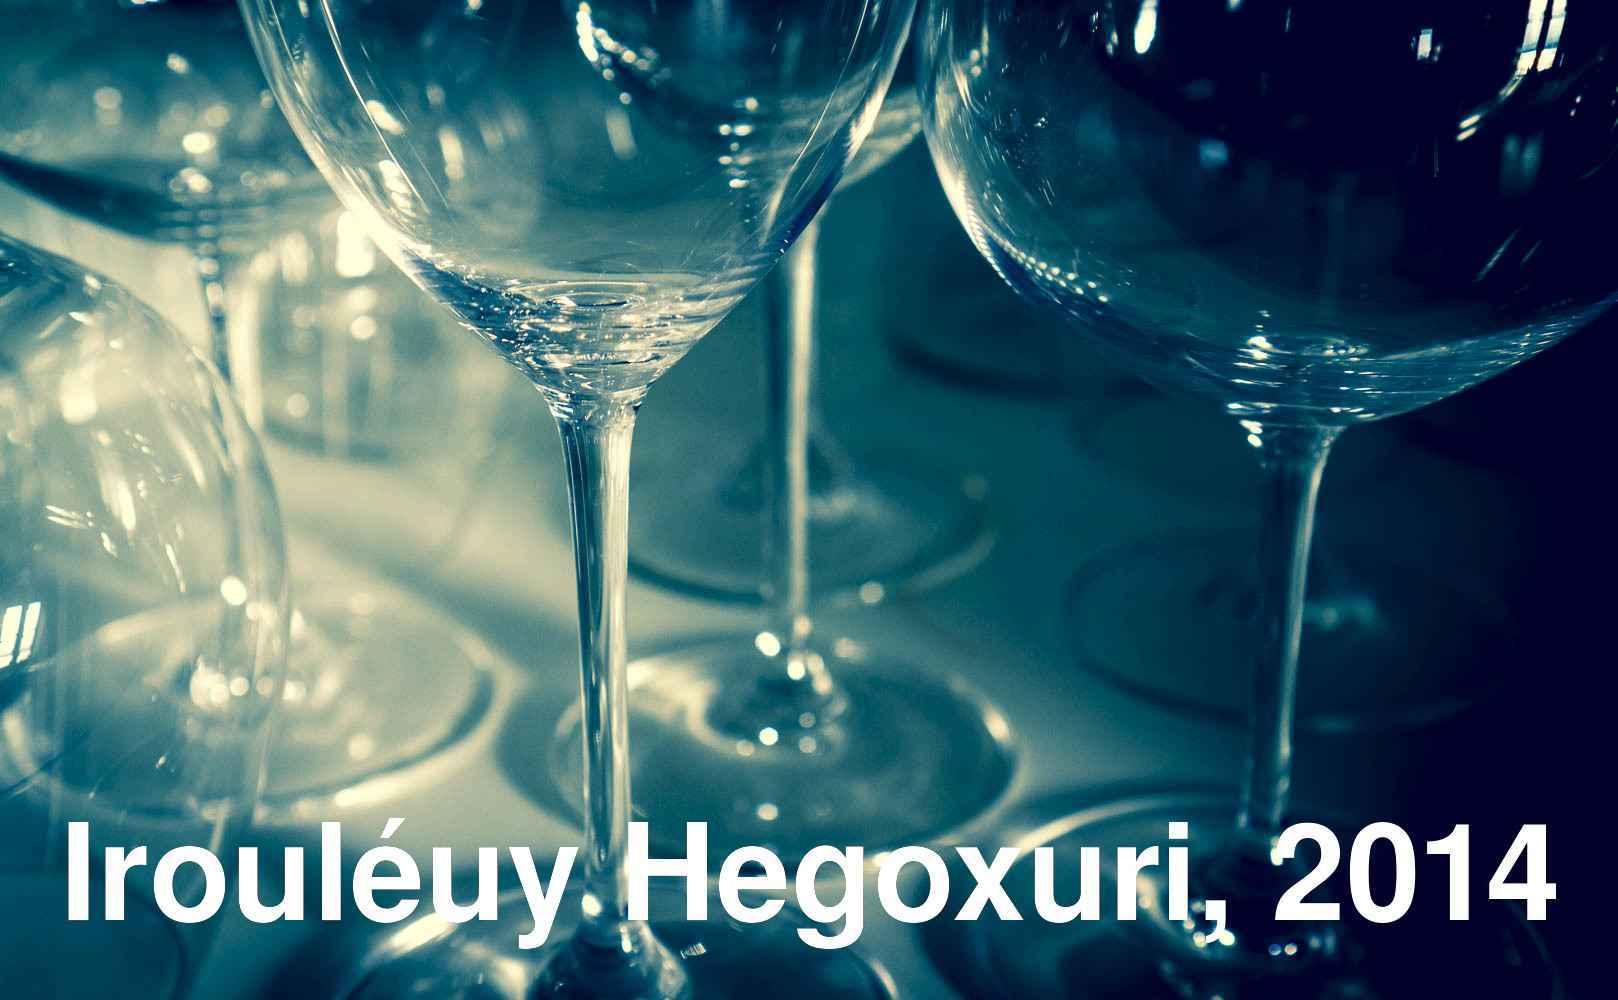 Go to Irouléuy Hegoxuri, 2014 von Domaine Arretxea aus Pays Basque, Frankreich